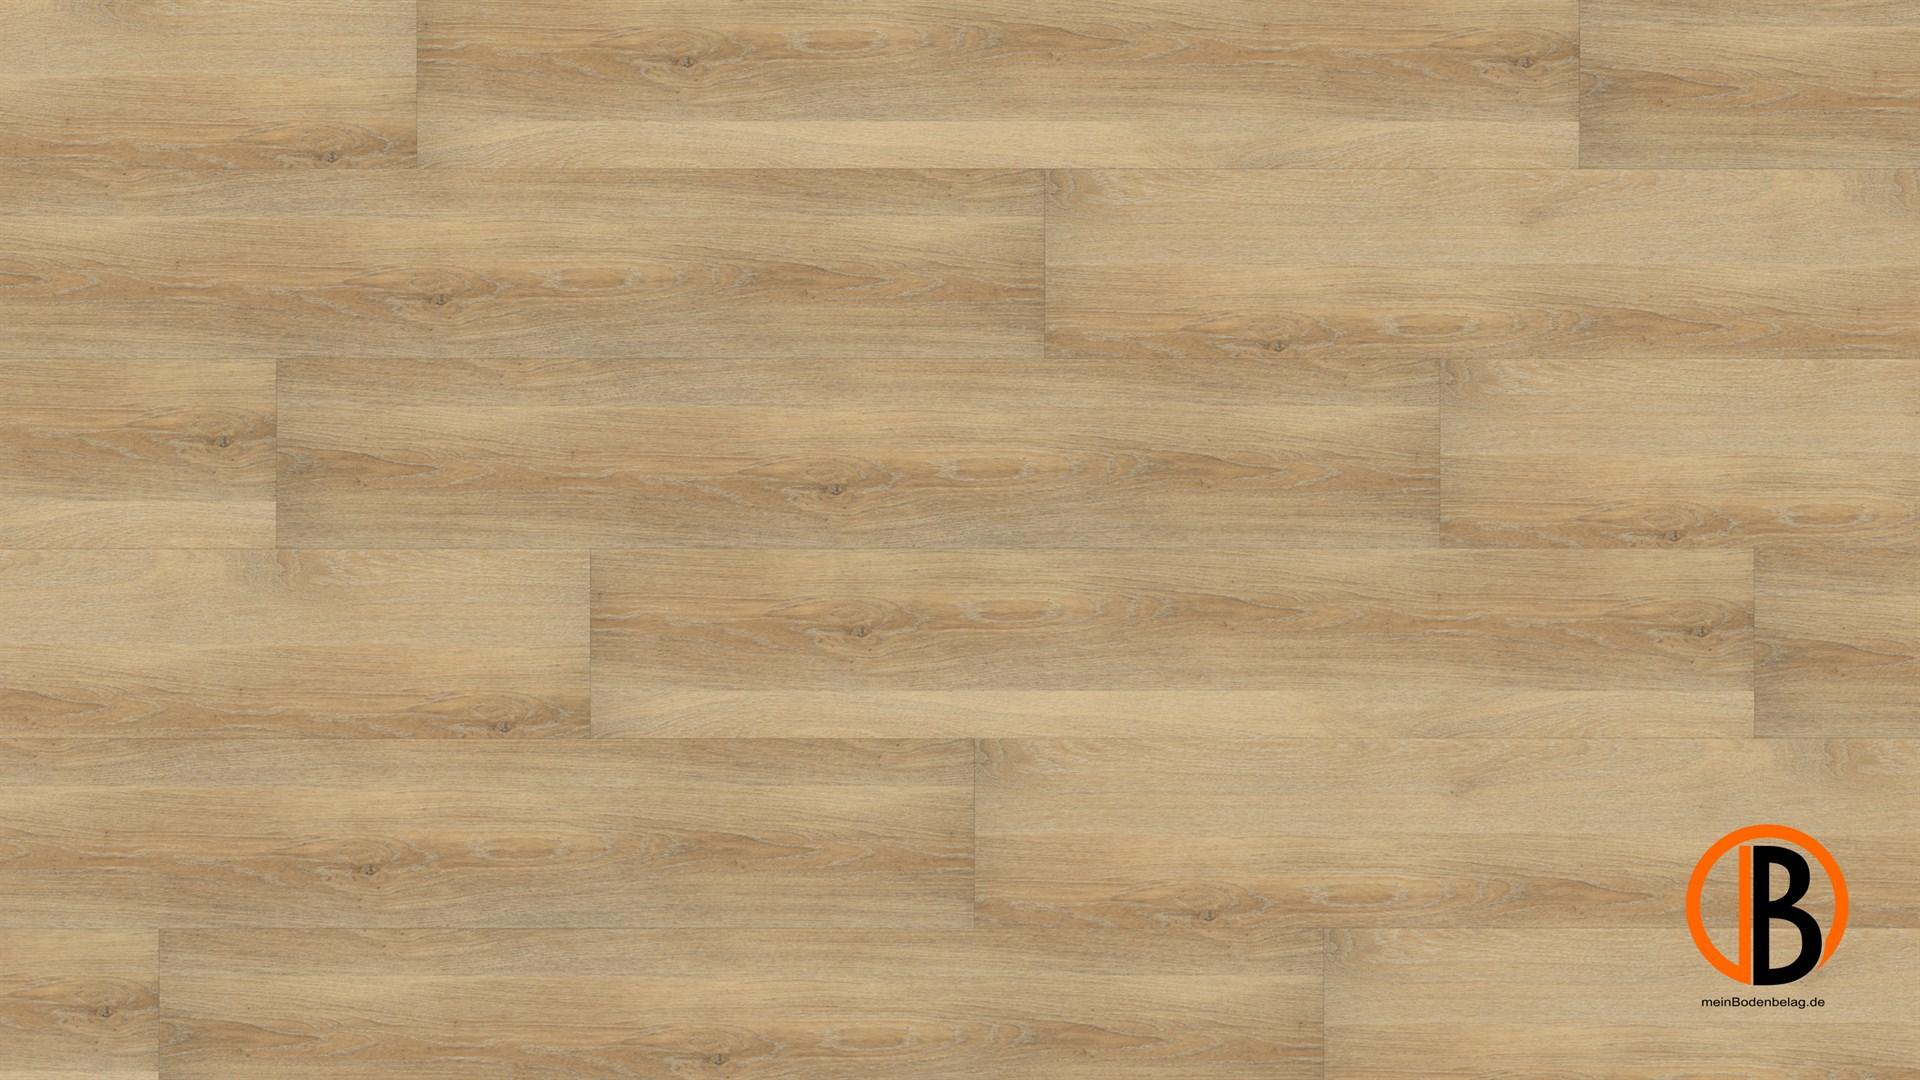 CINQUE KWG DESIGNERVINYL ANTIGUA INFINITY EXTEND SHEETS | 10000227;0 | Bild 1